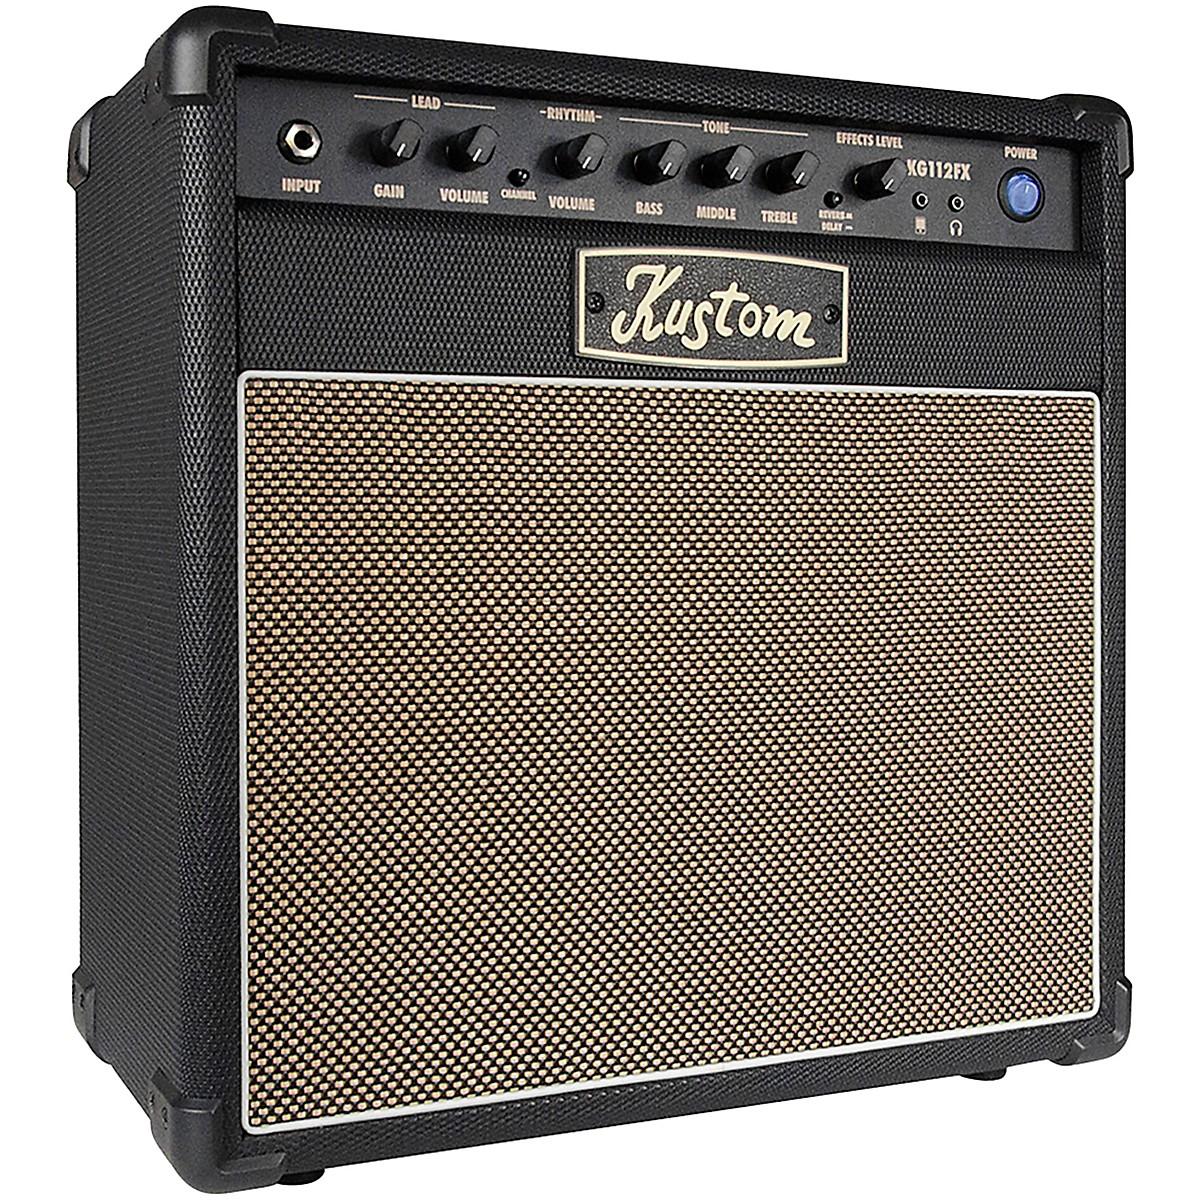 Kustom KG112FX 20W 1x12 Guitar Combo Amp